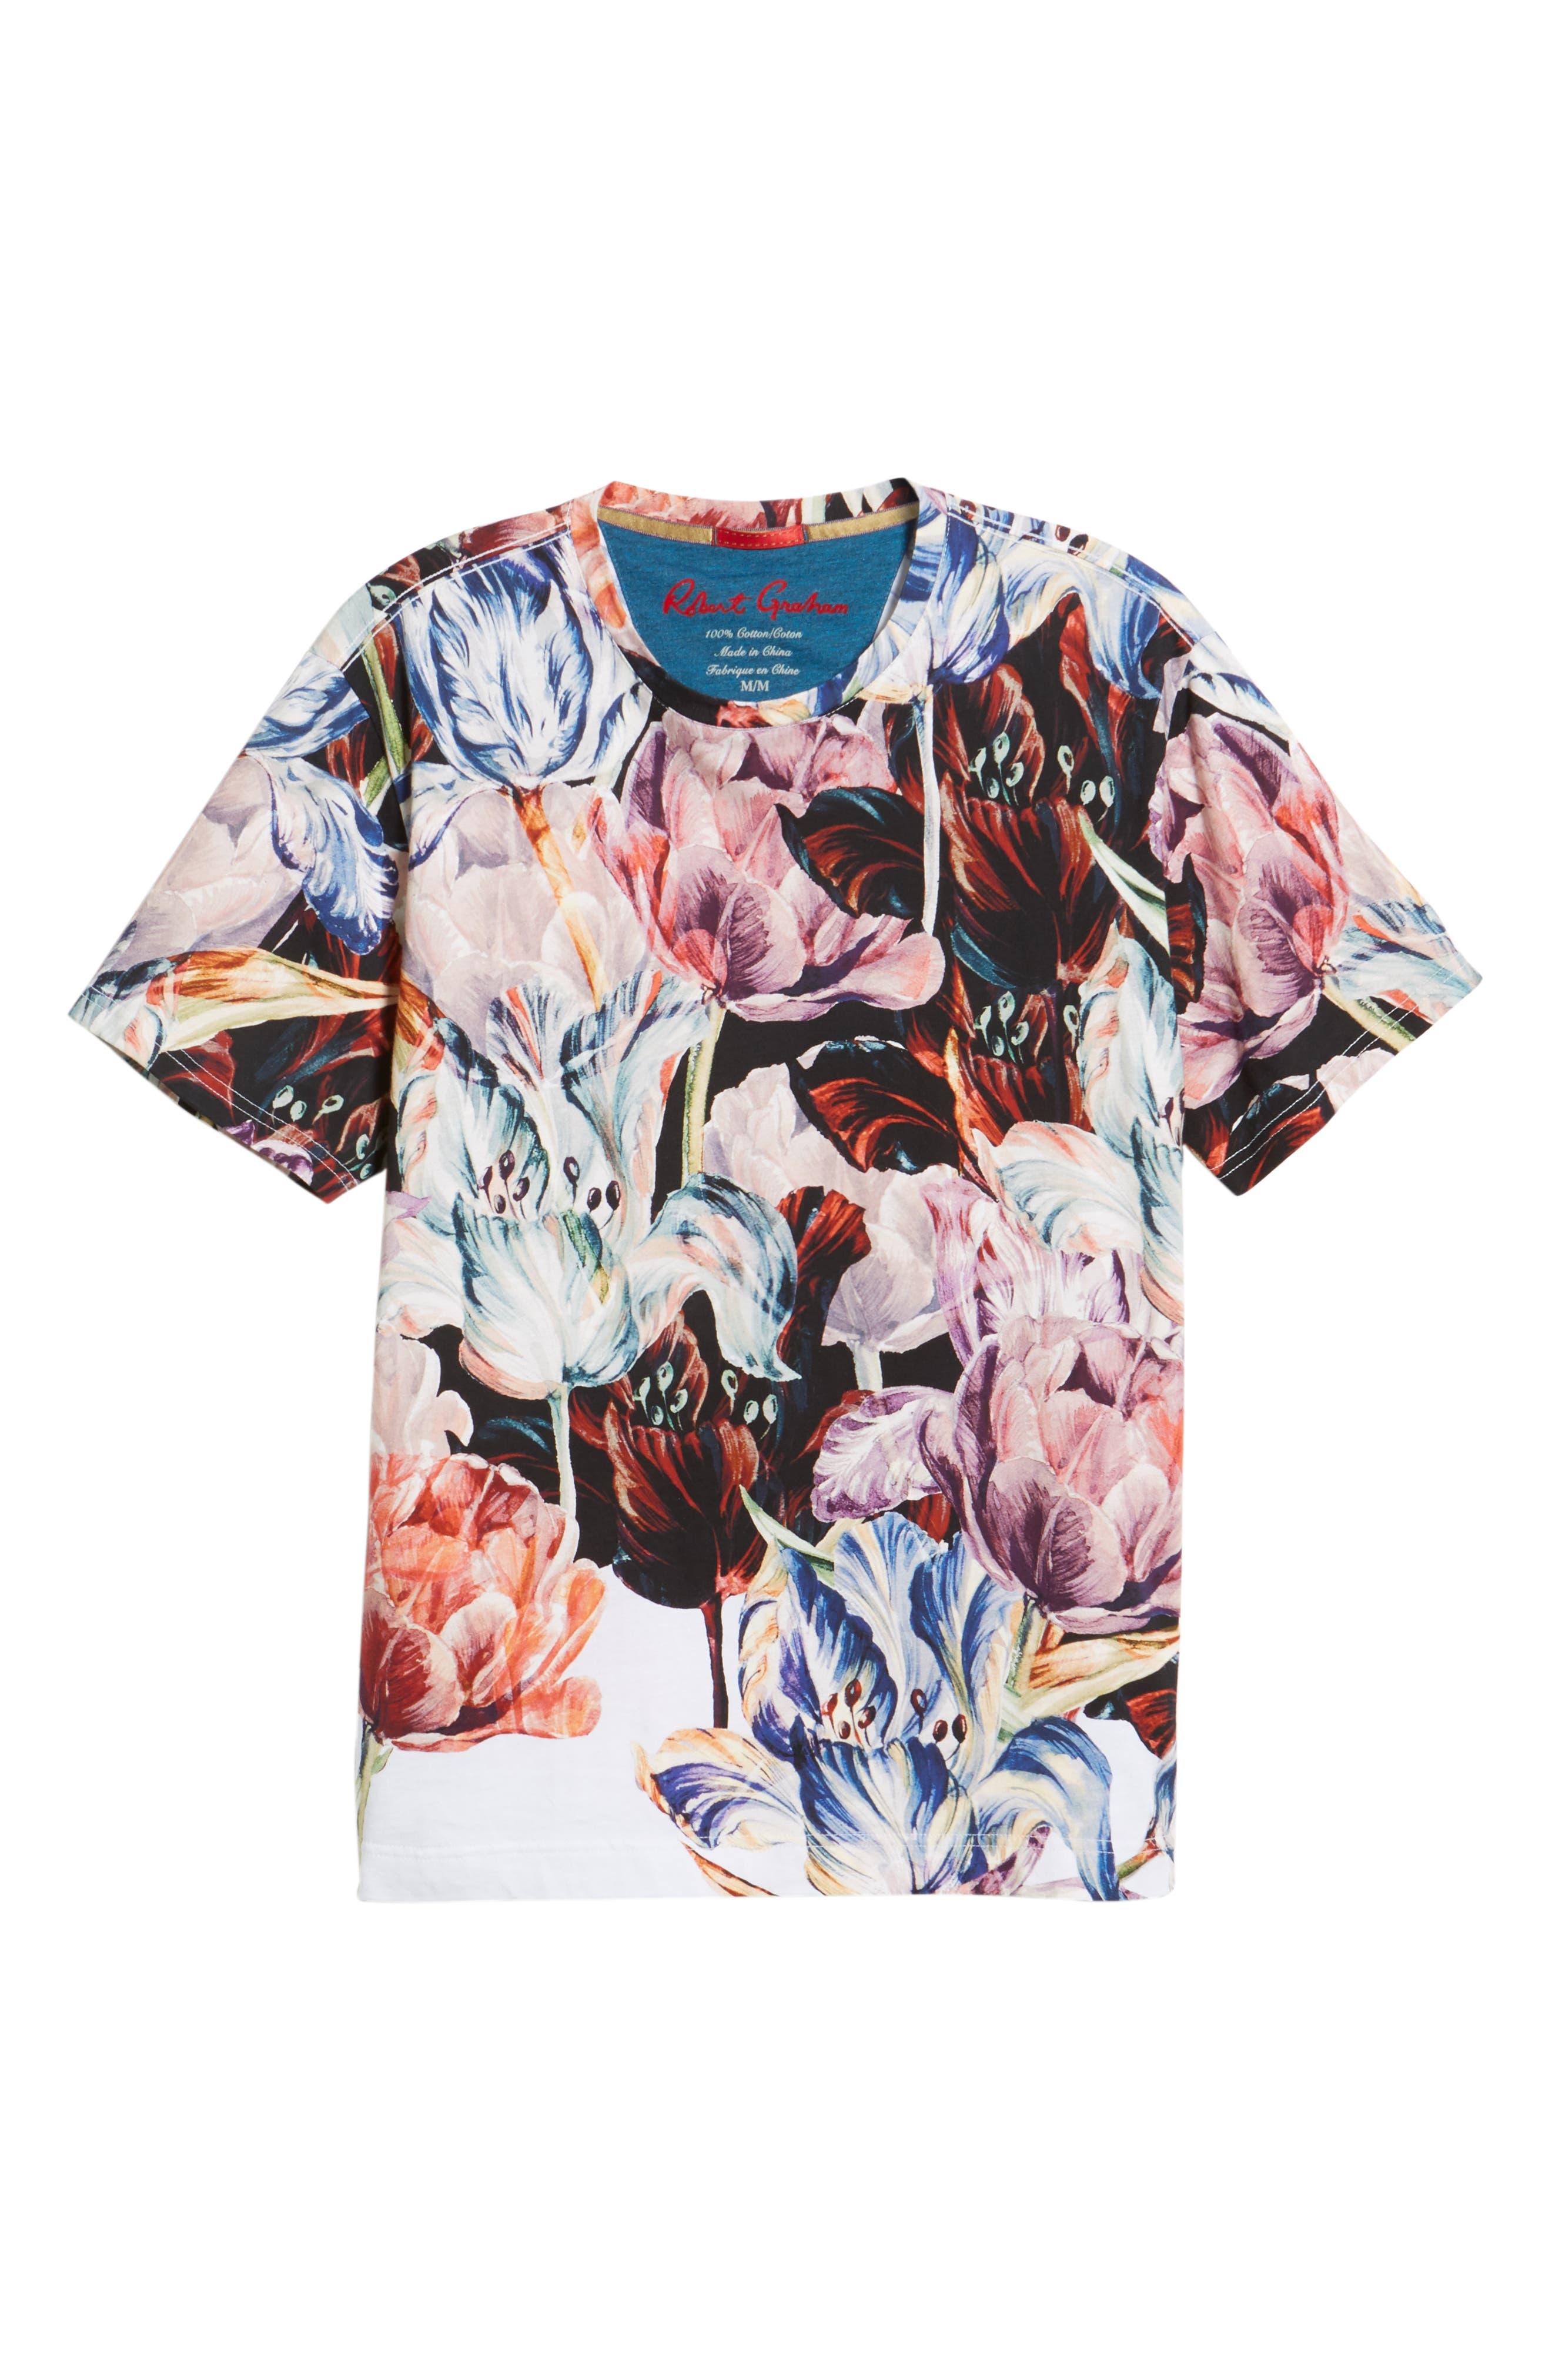 Eddystone T-Shirt,                             Alternate thumbnail 6, color,                             650